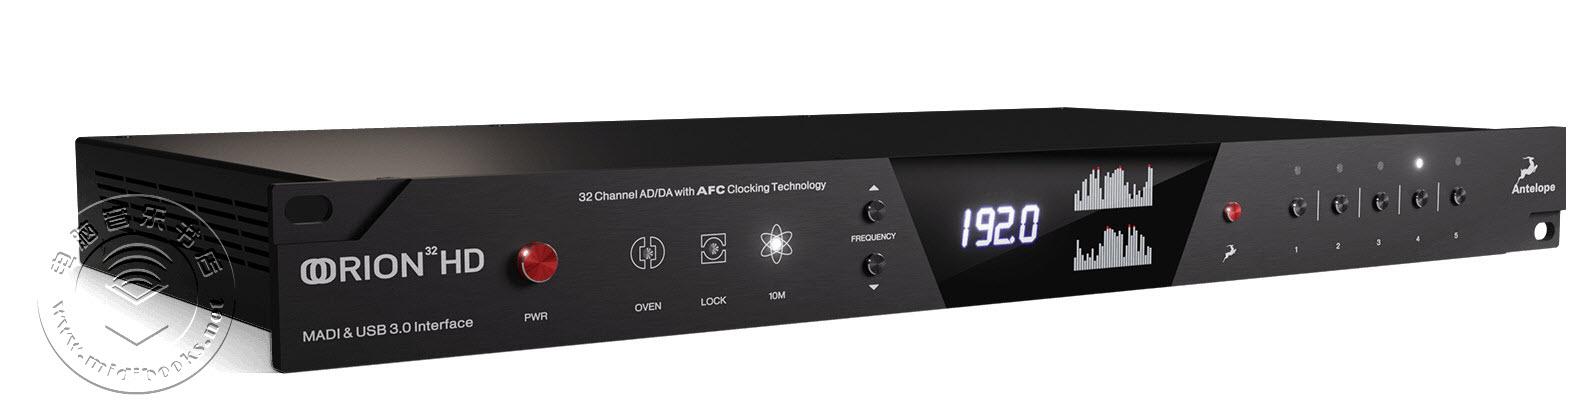 Antelope Audio(羚羊音频)发布最新的Orion 32HD/Gen 3高端音频接口